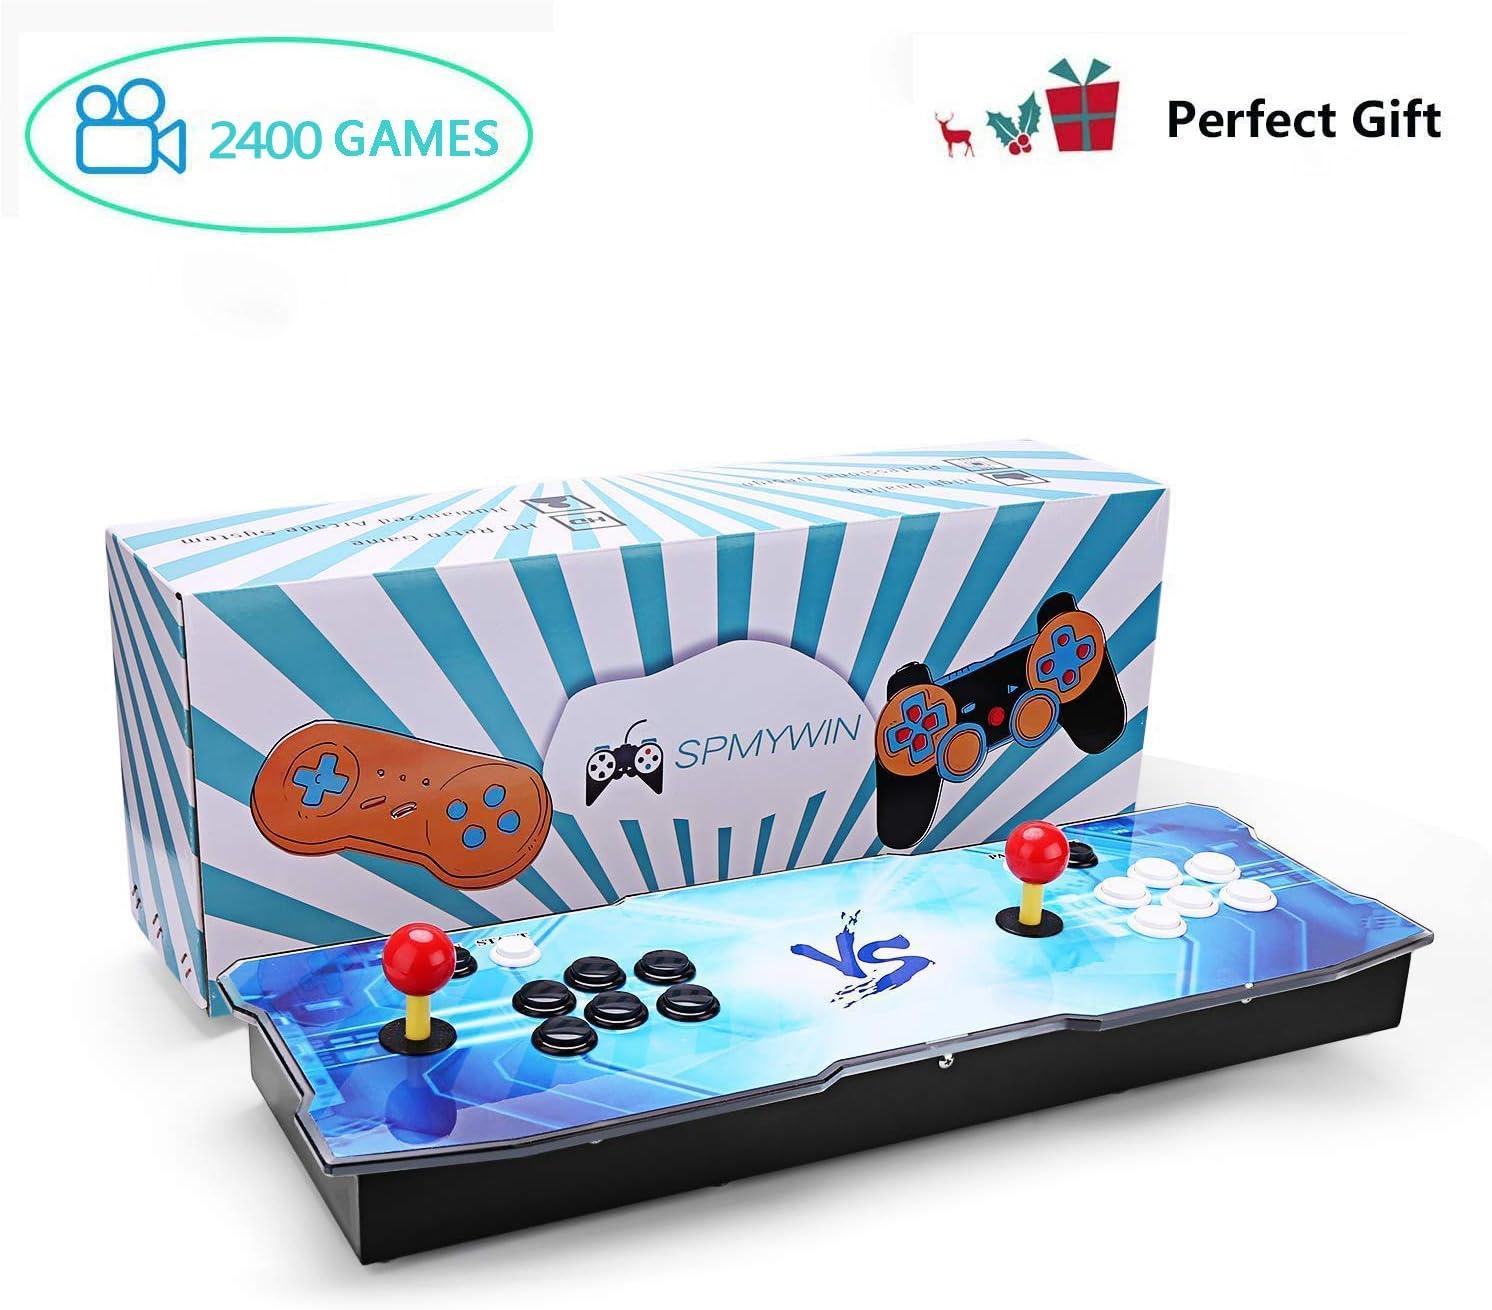 Spmywin 2400 2D Pandora Box Arcade Video Game Console 720P Full HD Retro Consola Arcade Video Gamepad Expandir juegos 2D Lista Inteligente